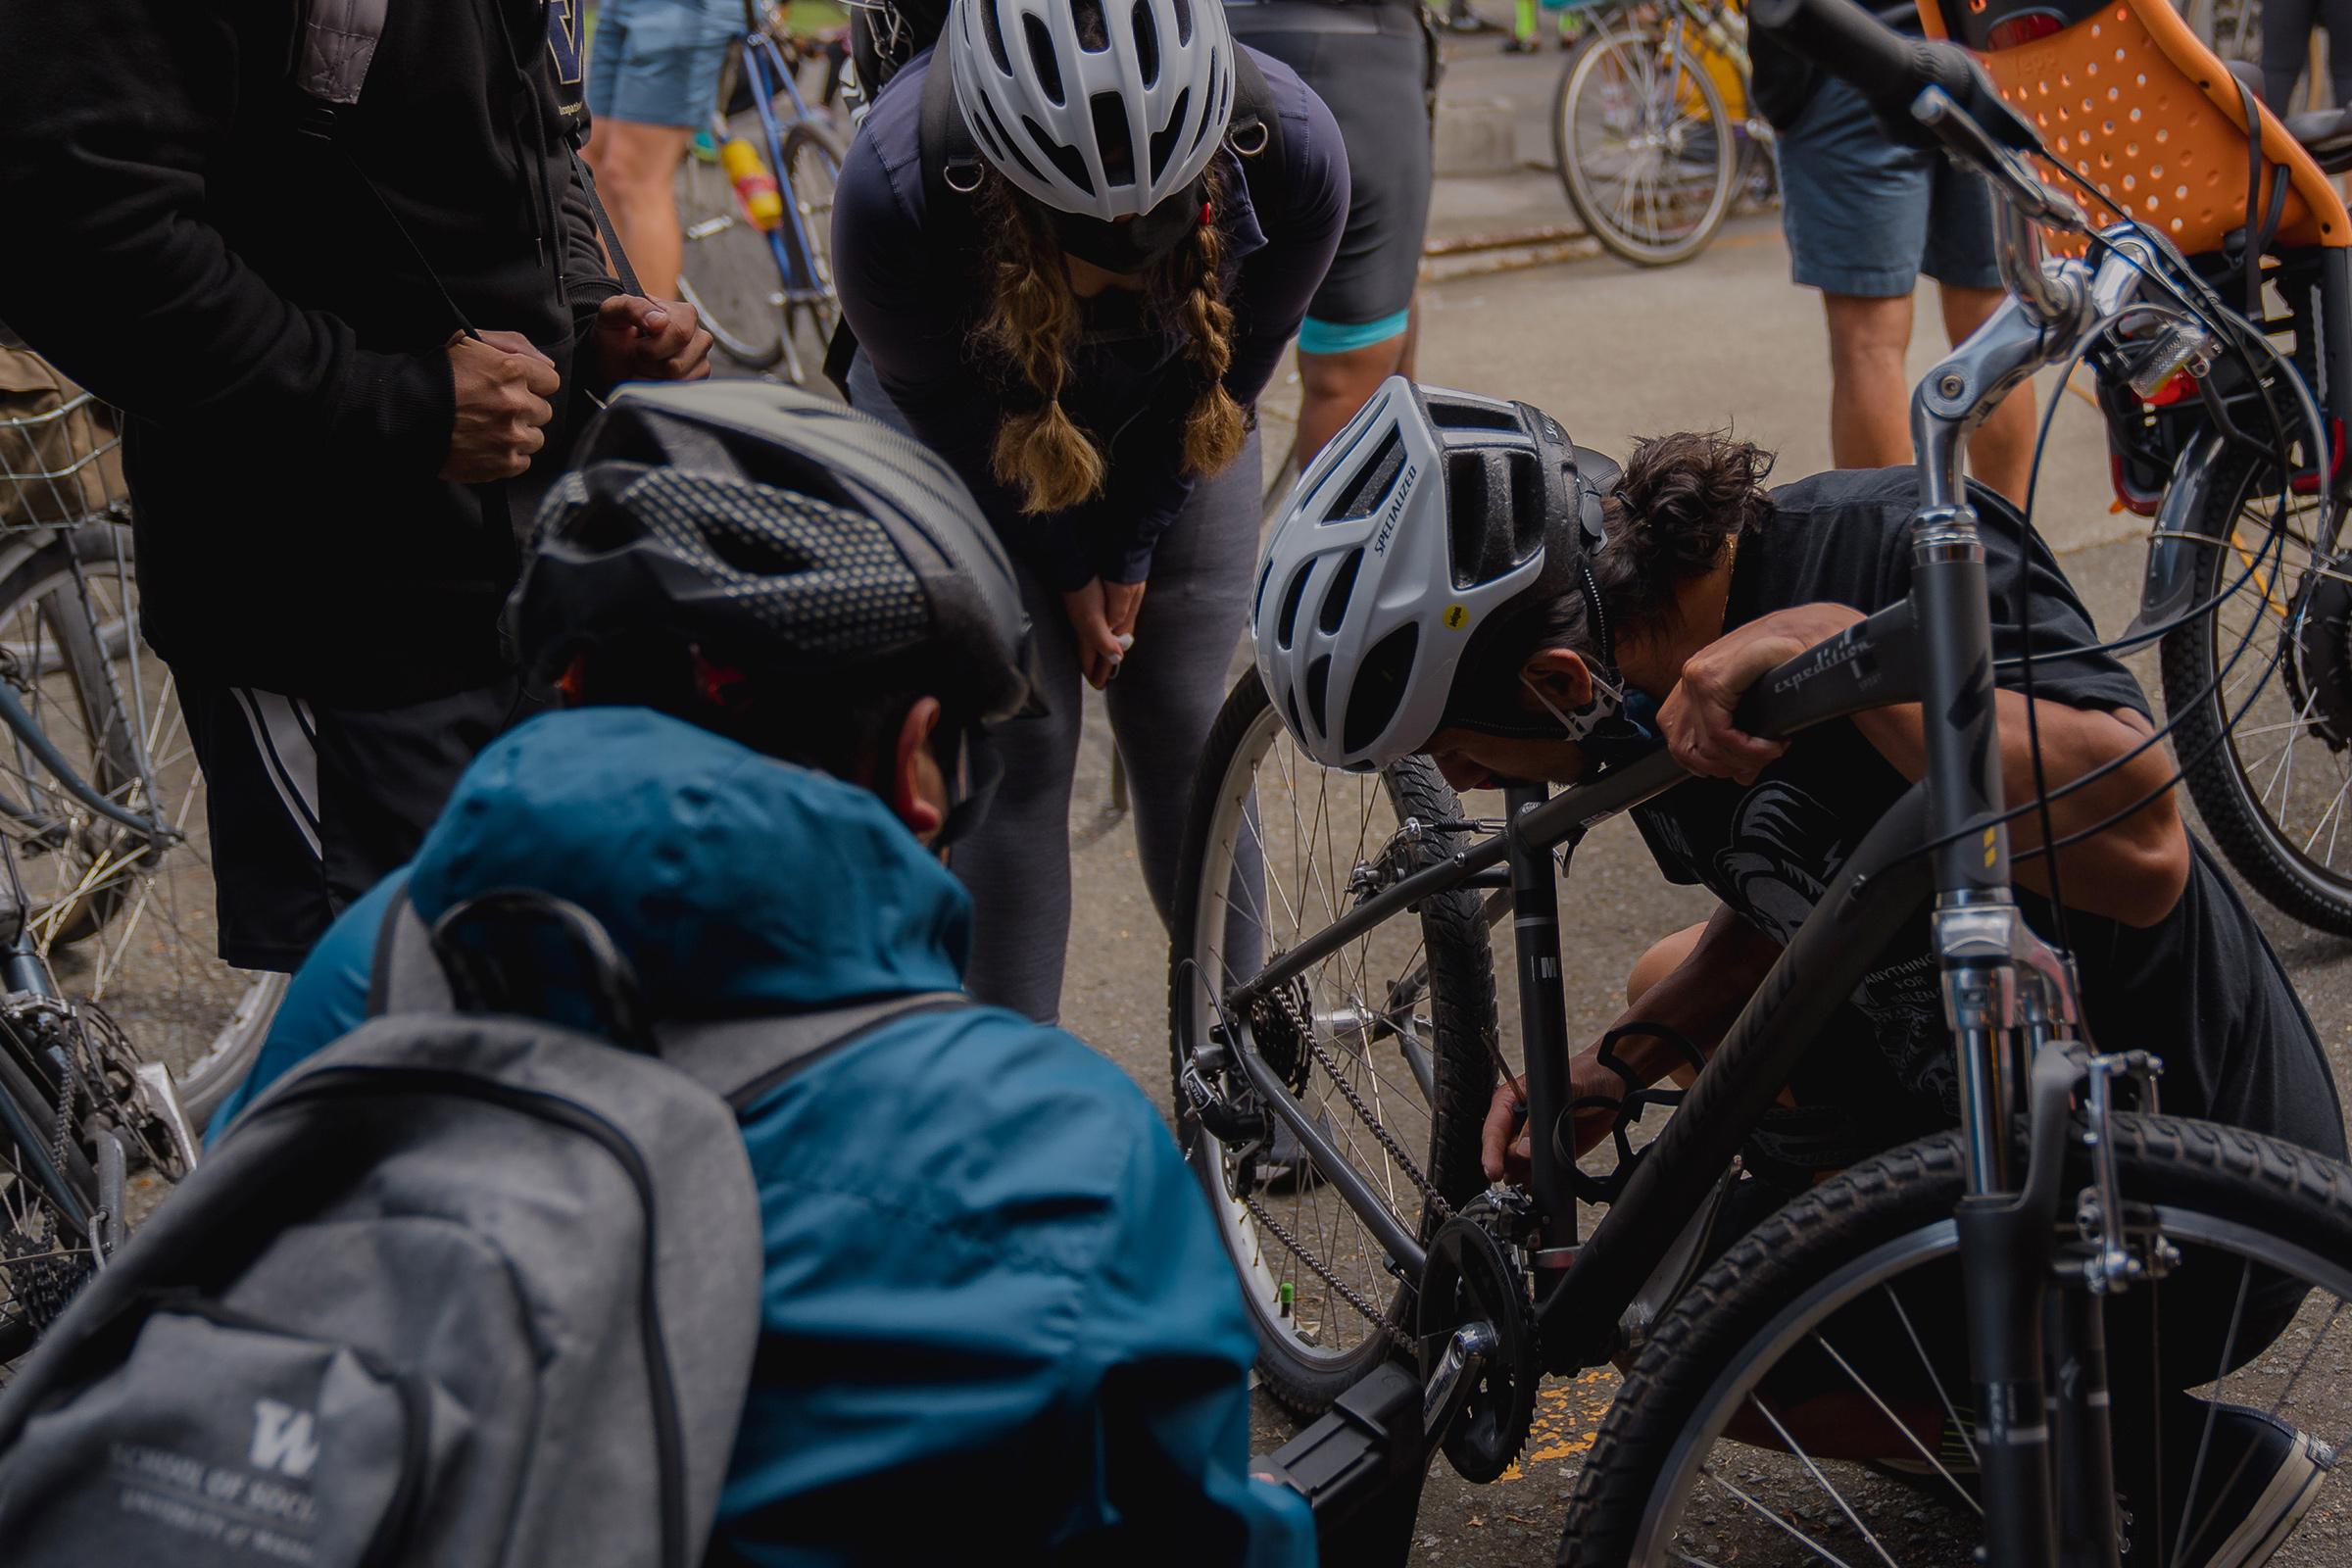 Members of the NorthStar Cycling Club perform bike maintenance before their weekly ride.